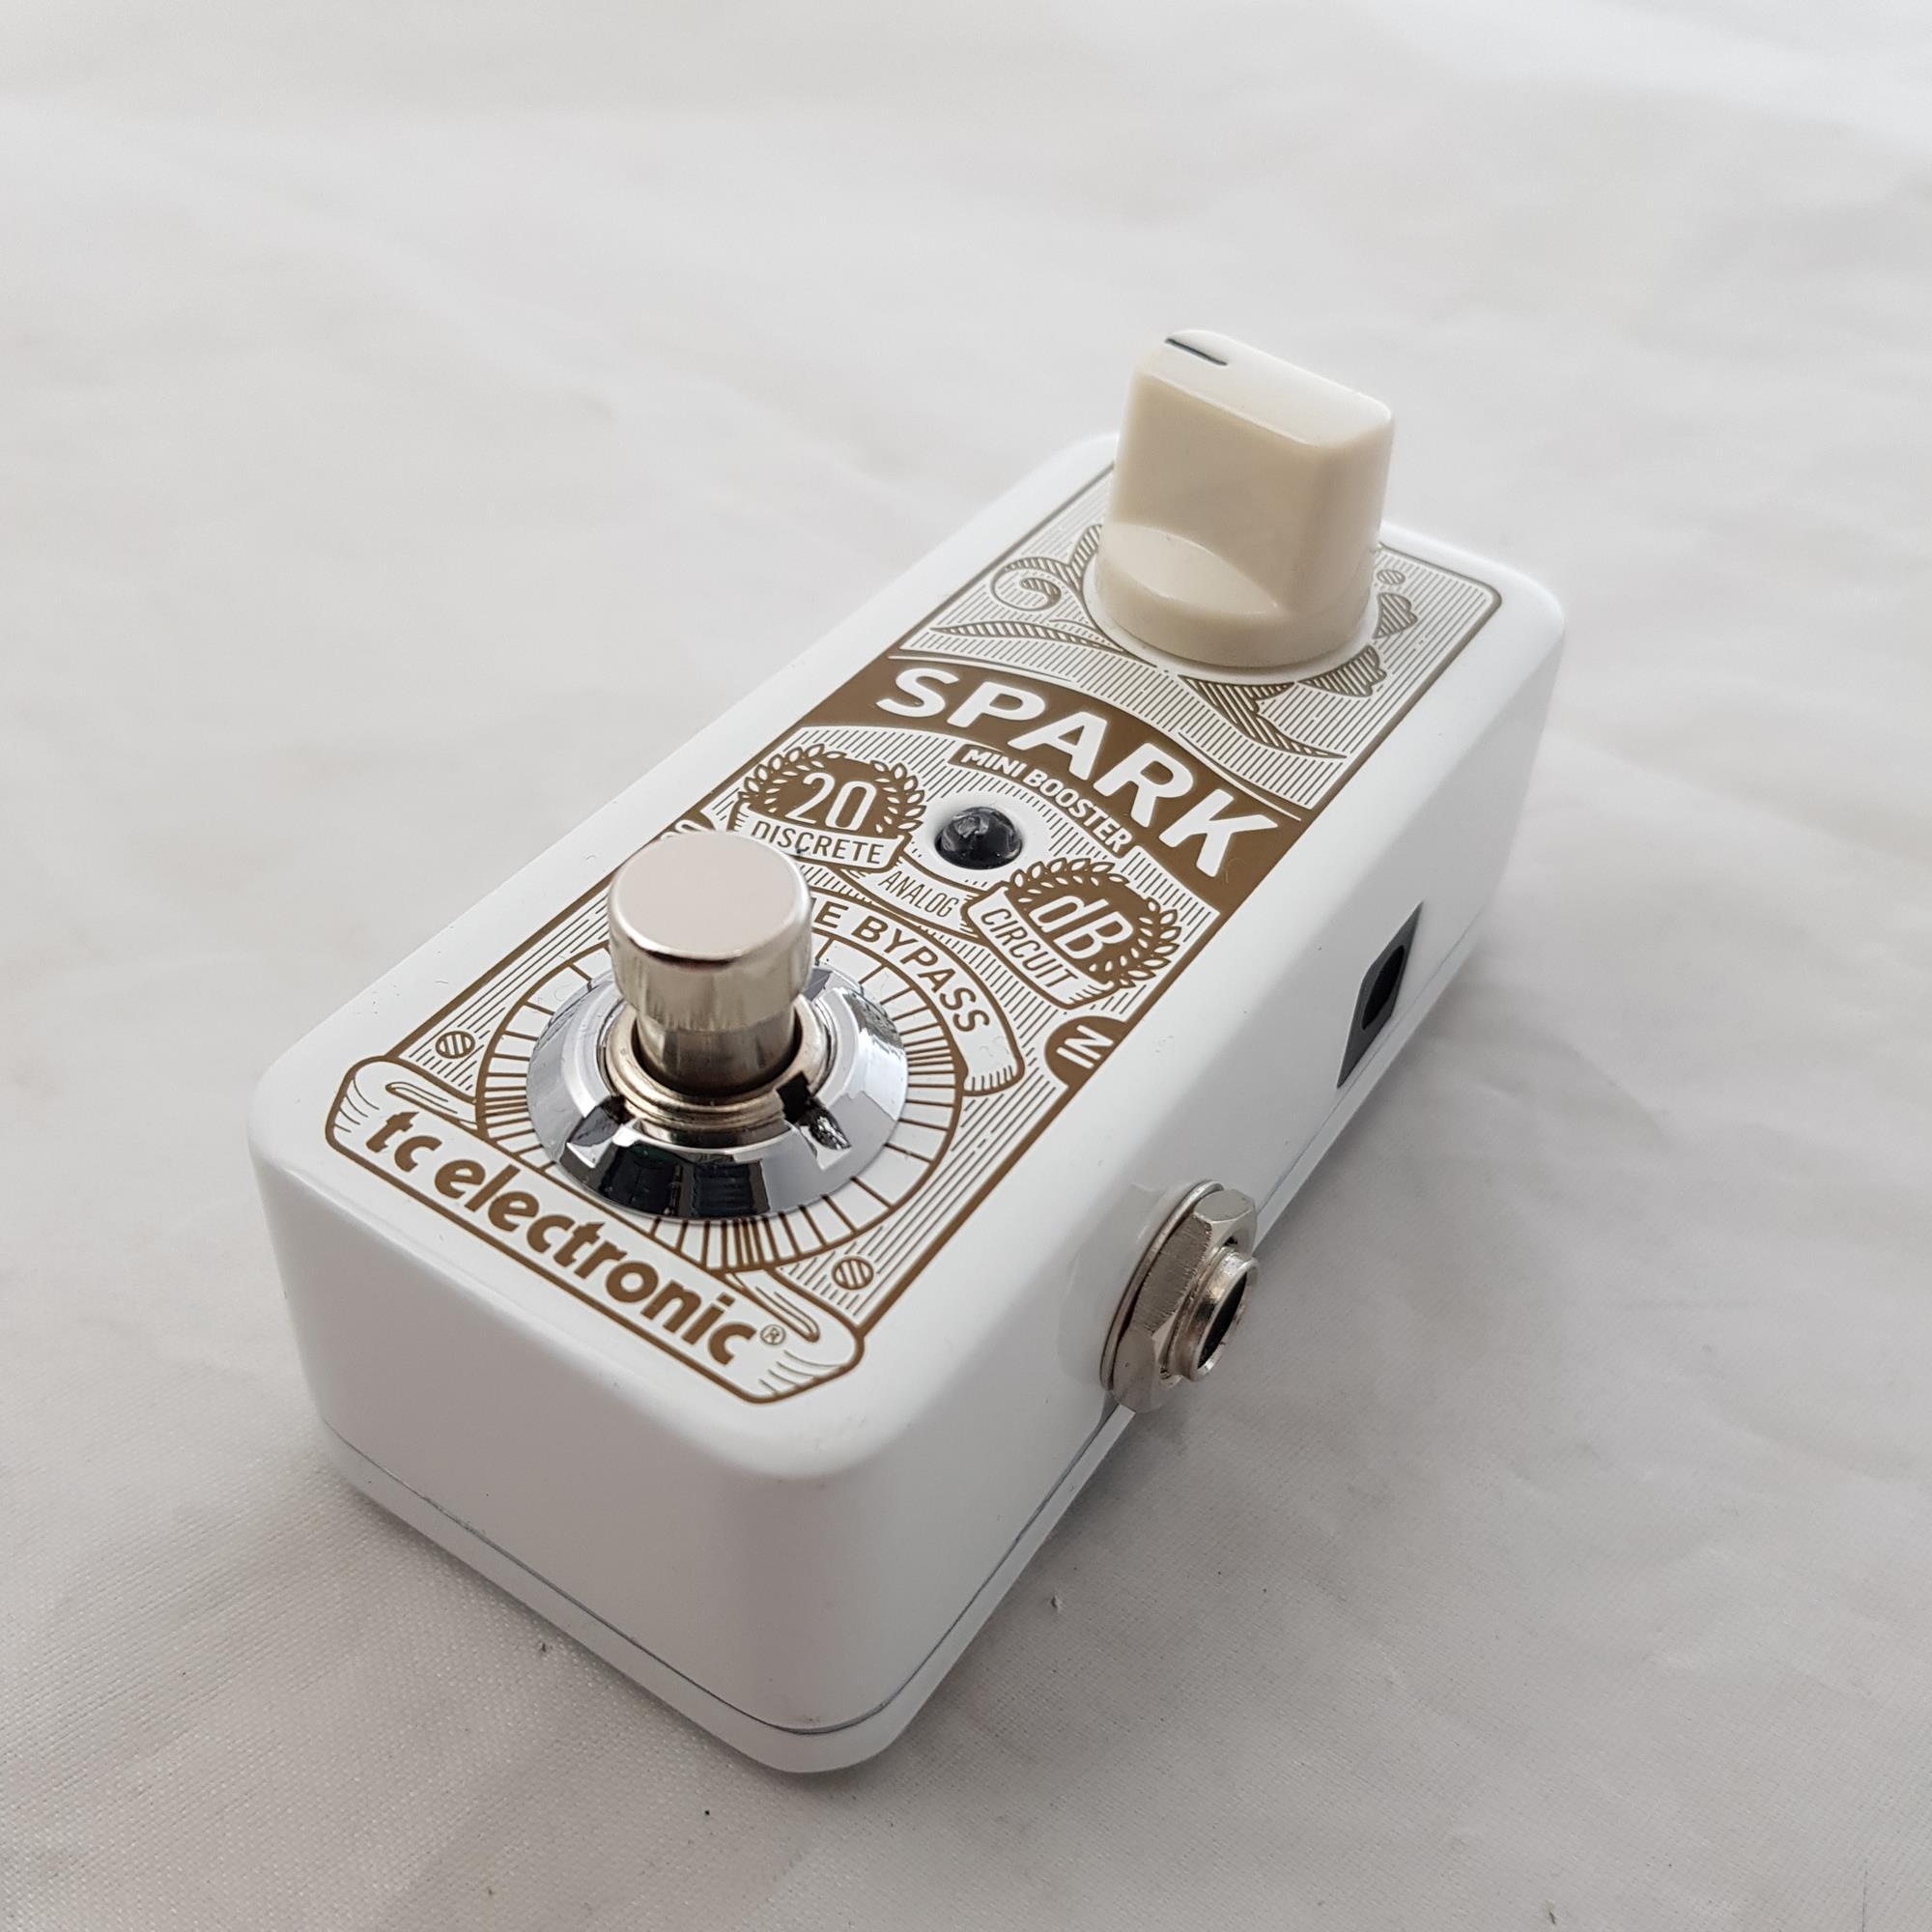 TC-ELECTRONICS-MINI-SPARK-BOOSTER-sku-1618657998726